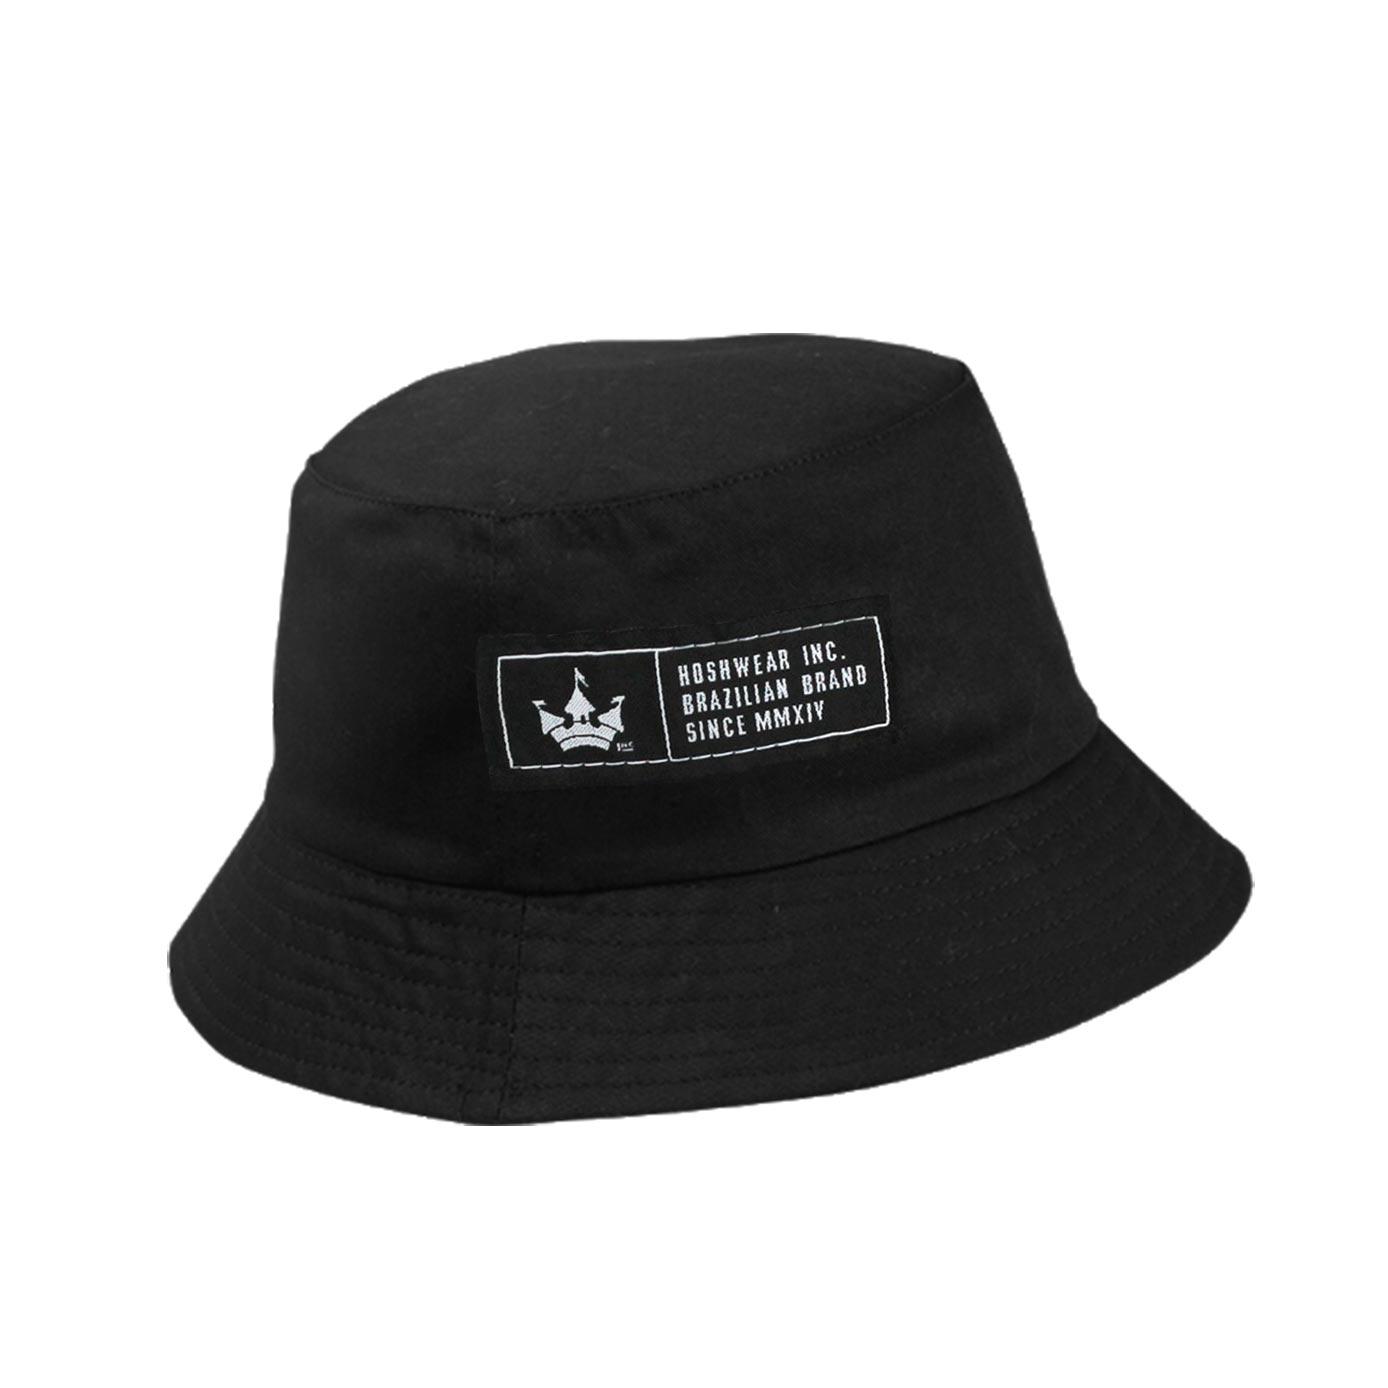 Bucket Hat Dupla Face Hoshwear Preto